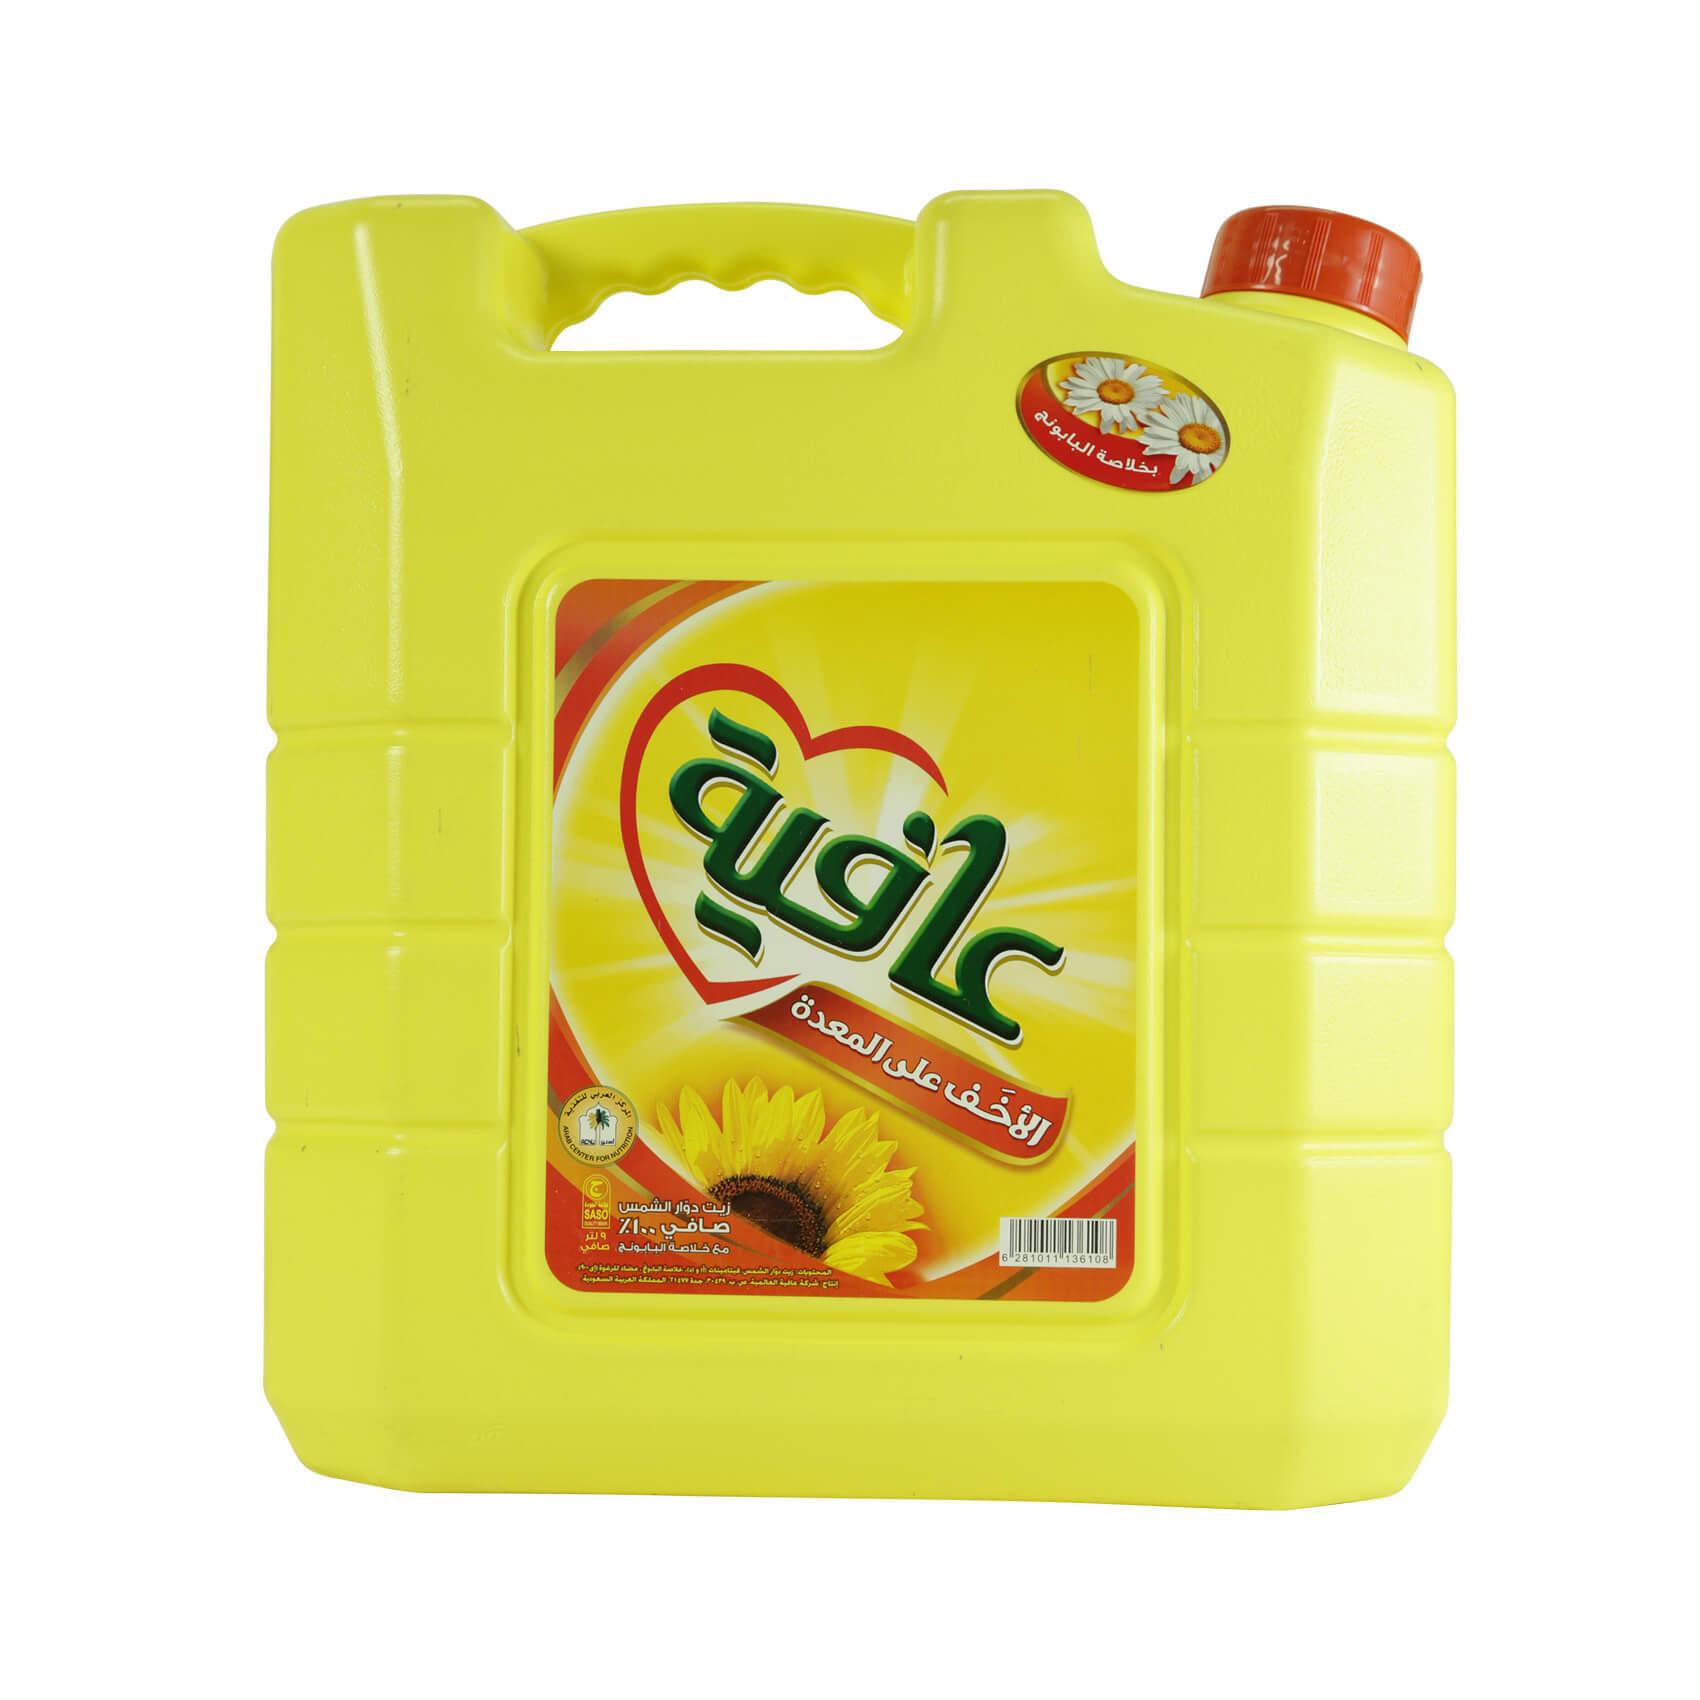 AFIA SUNFLOWER OIL 9L